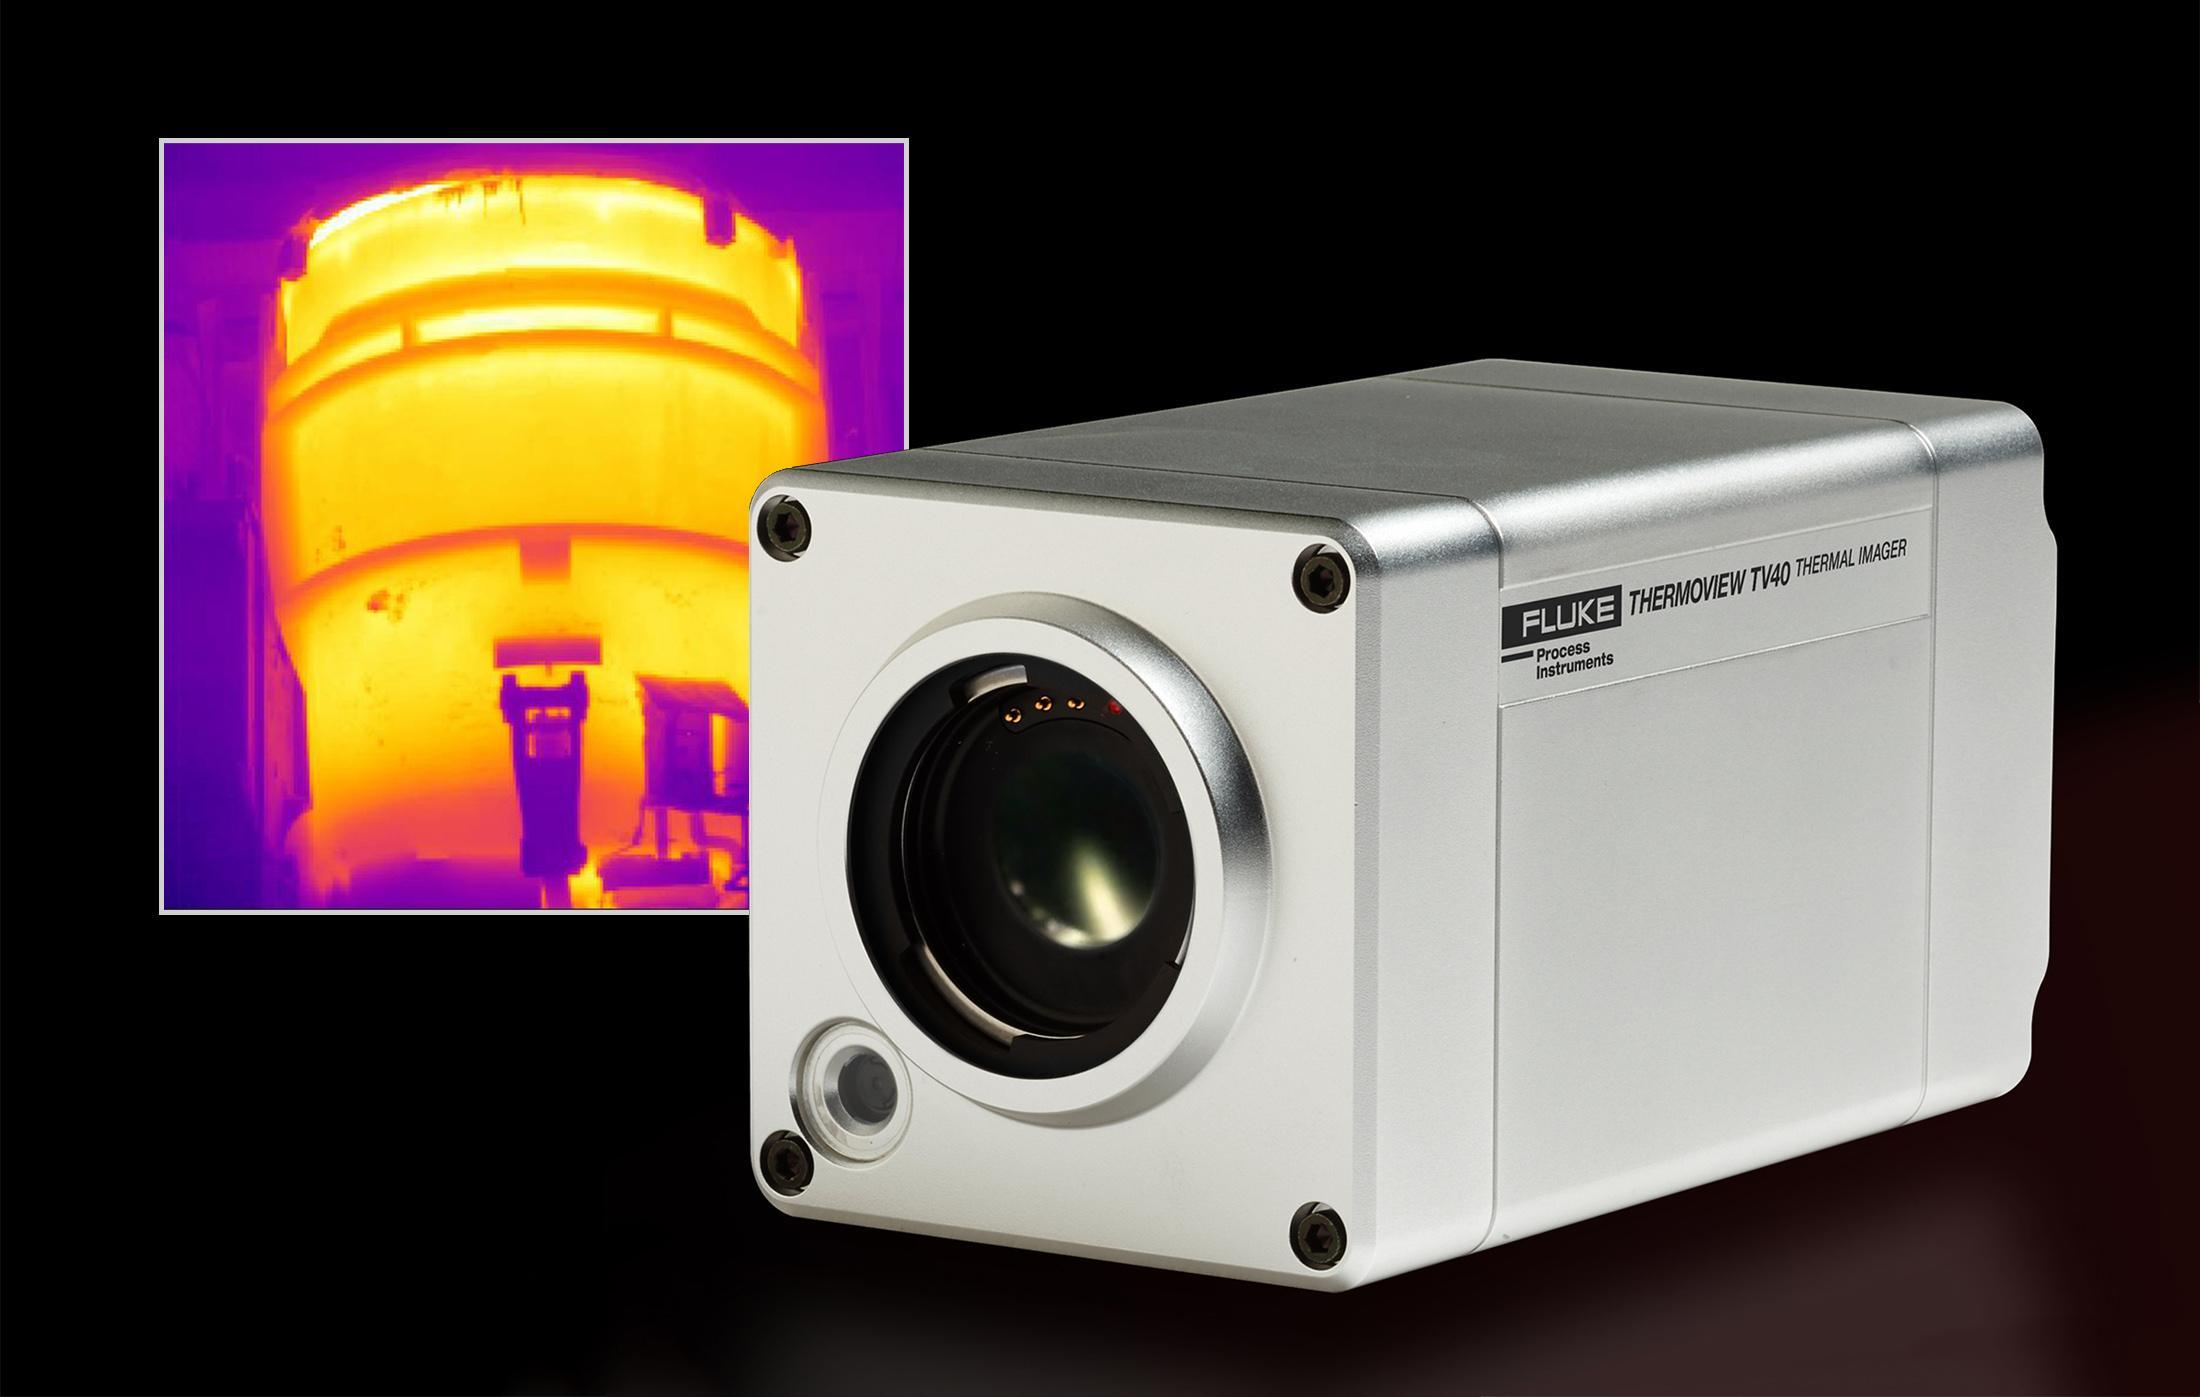 ThermoView TV40 Kamera mit Wärmebild